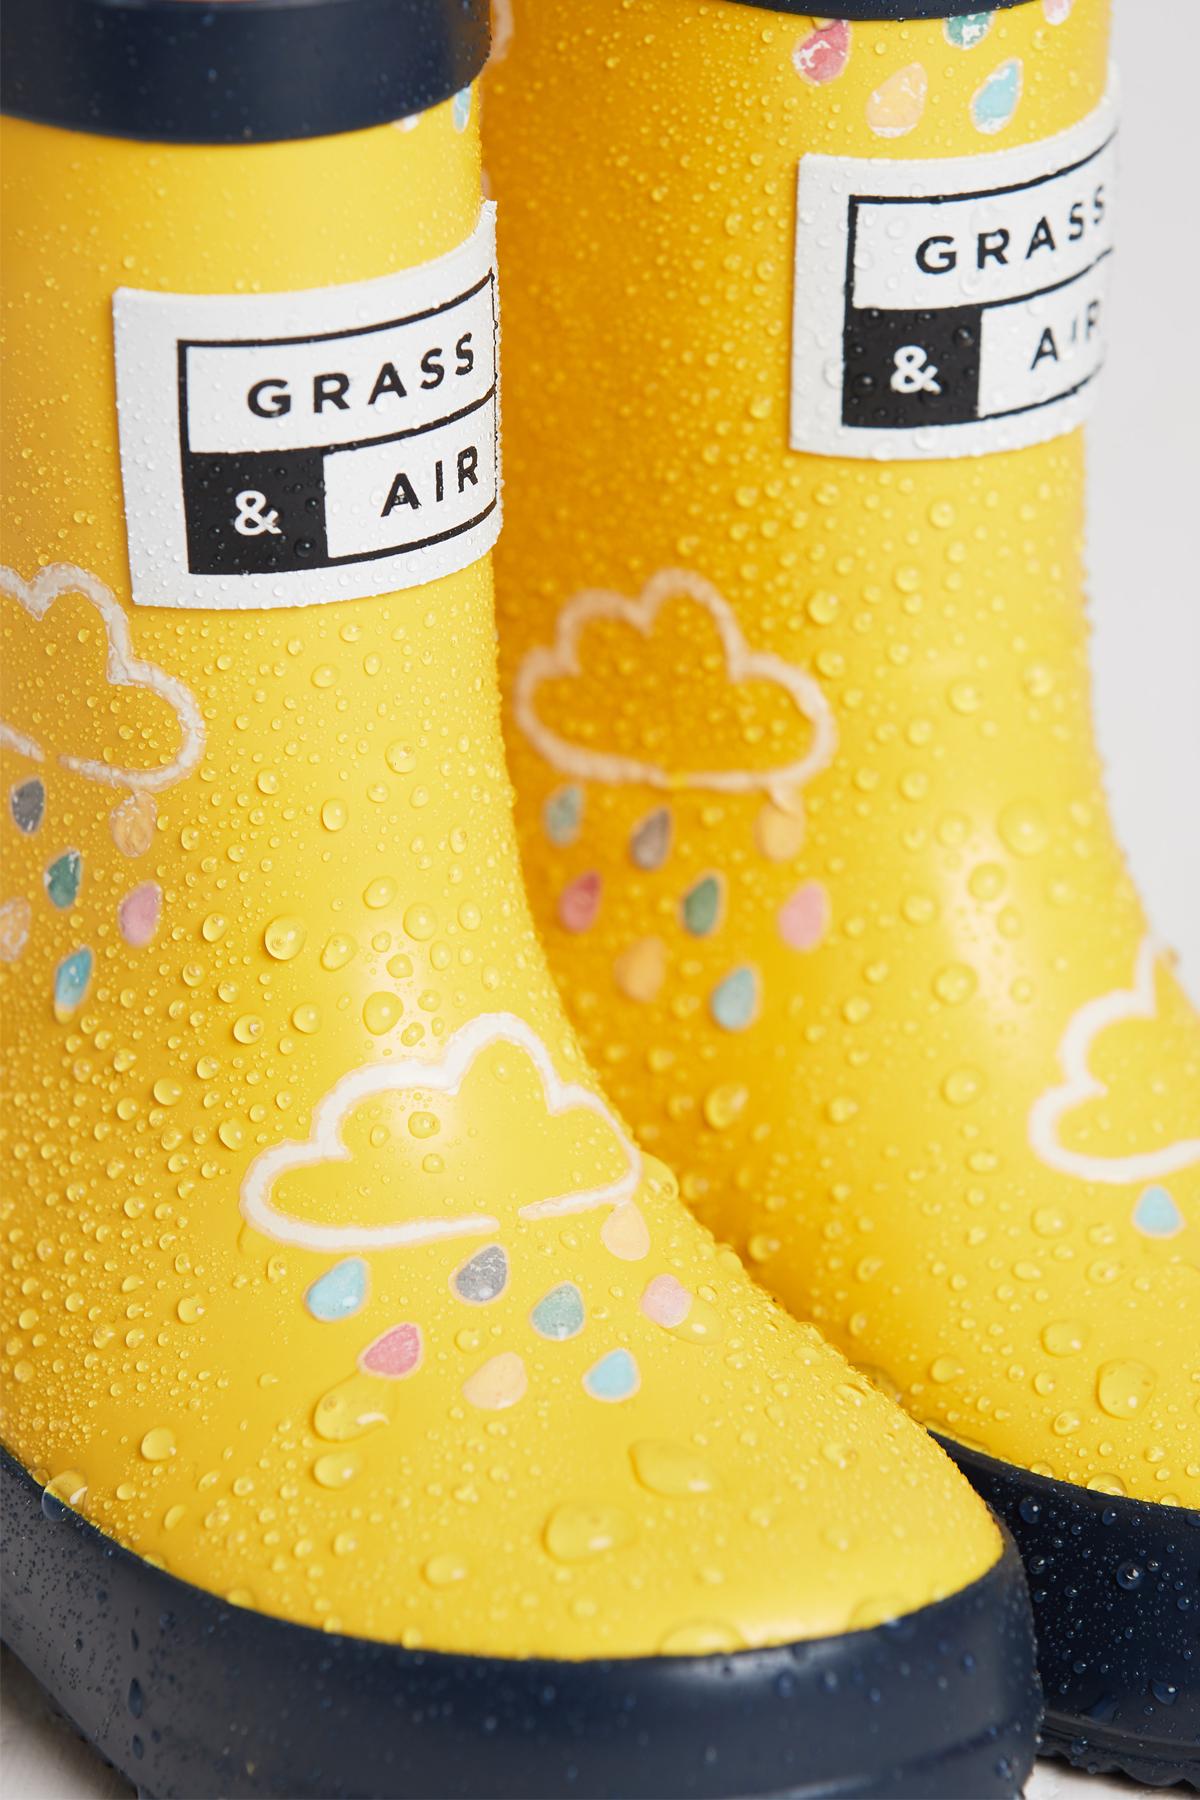 Grass & Air Colour Revealing Wellies - Yellow